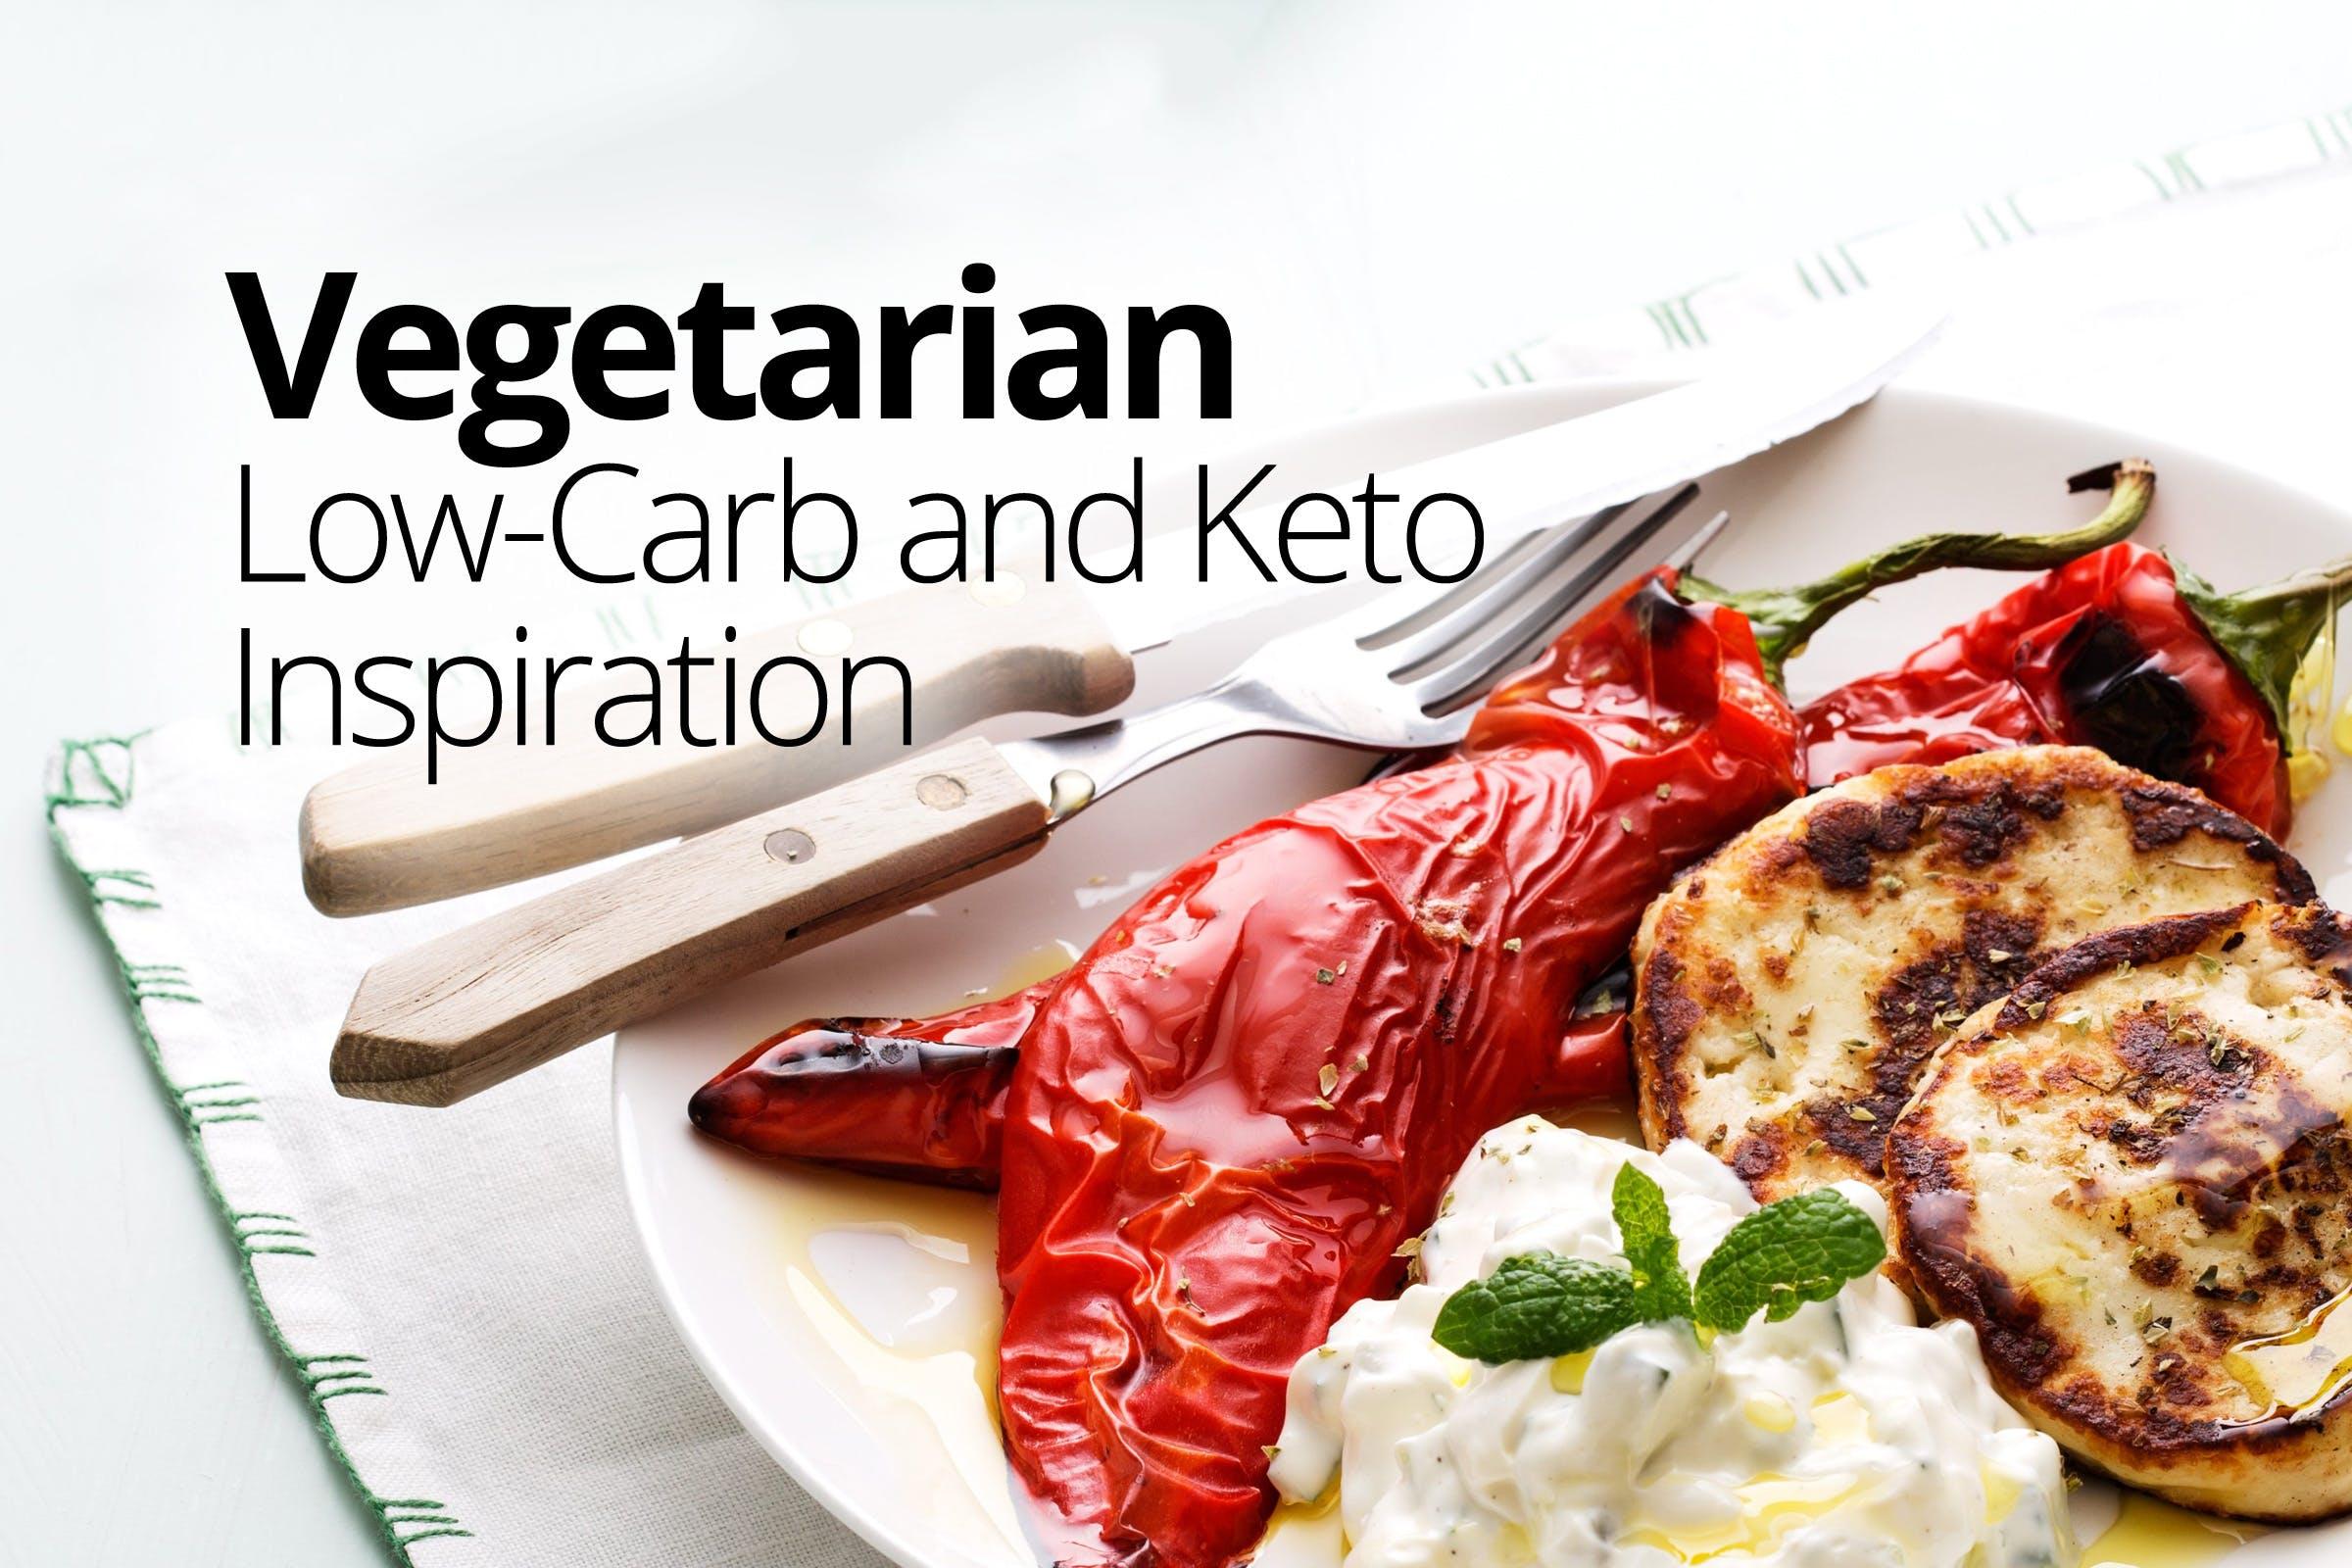 Vegetarian low-carb inspiration